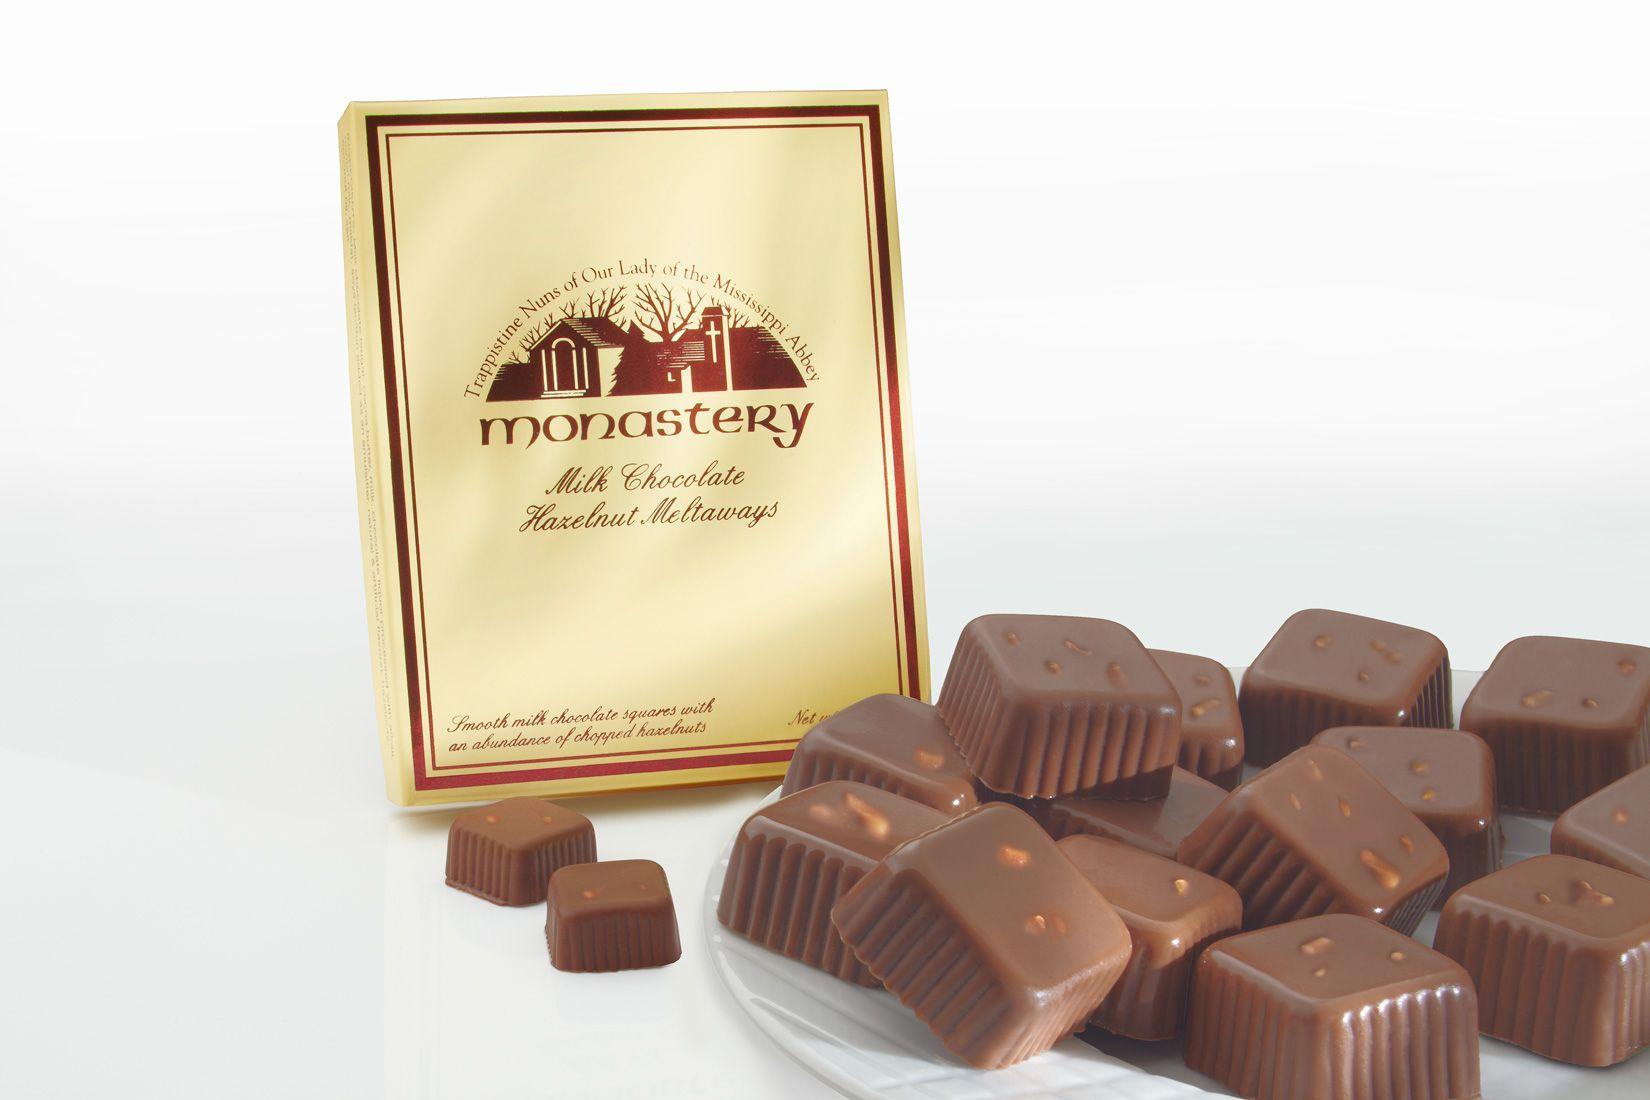 Monastery milk chocolate hazelnut meltaways food photography